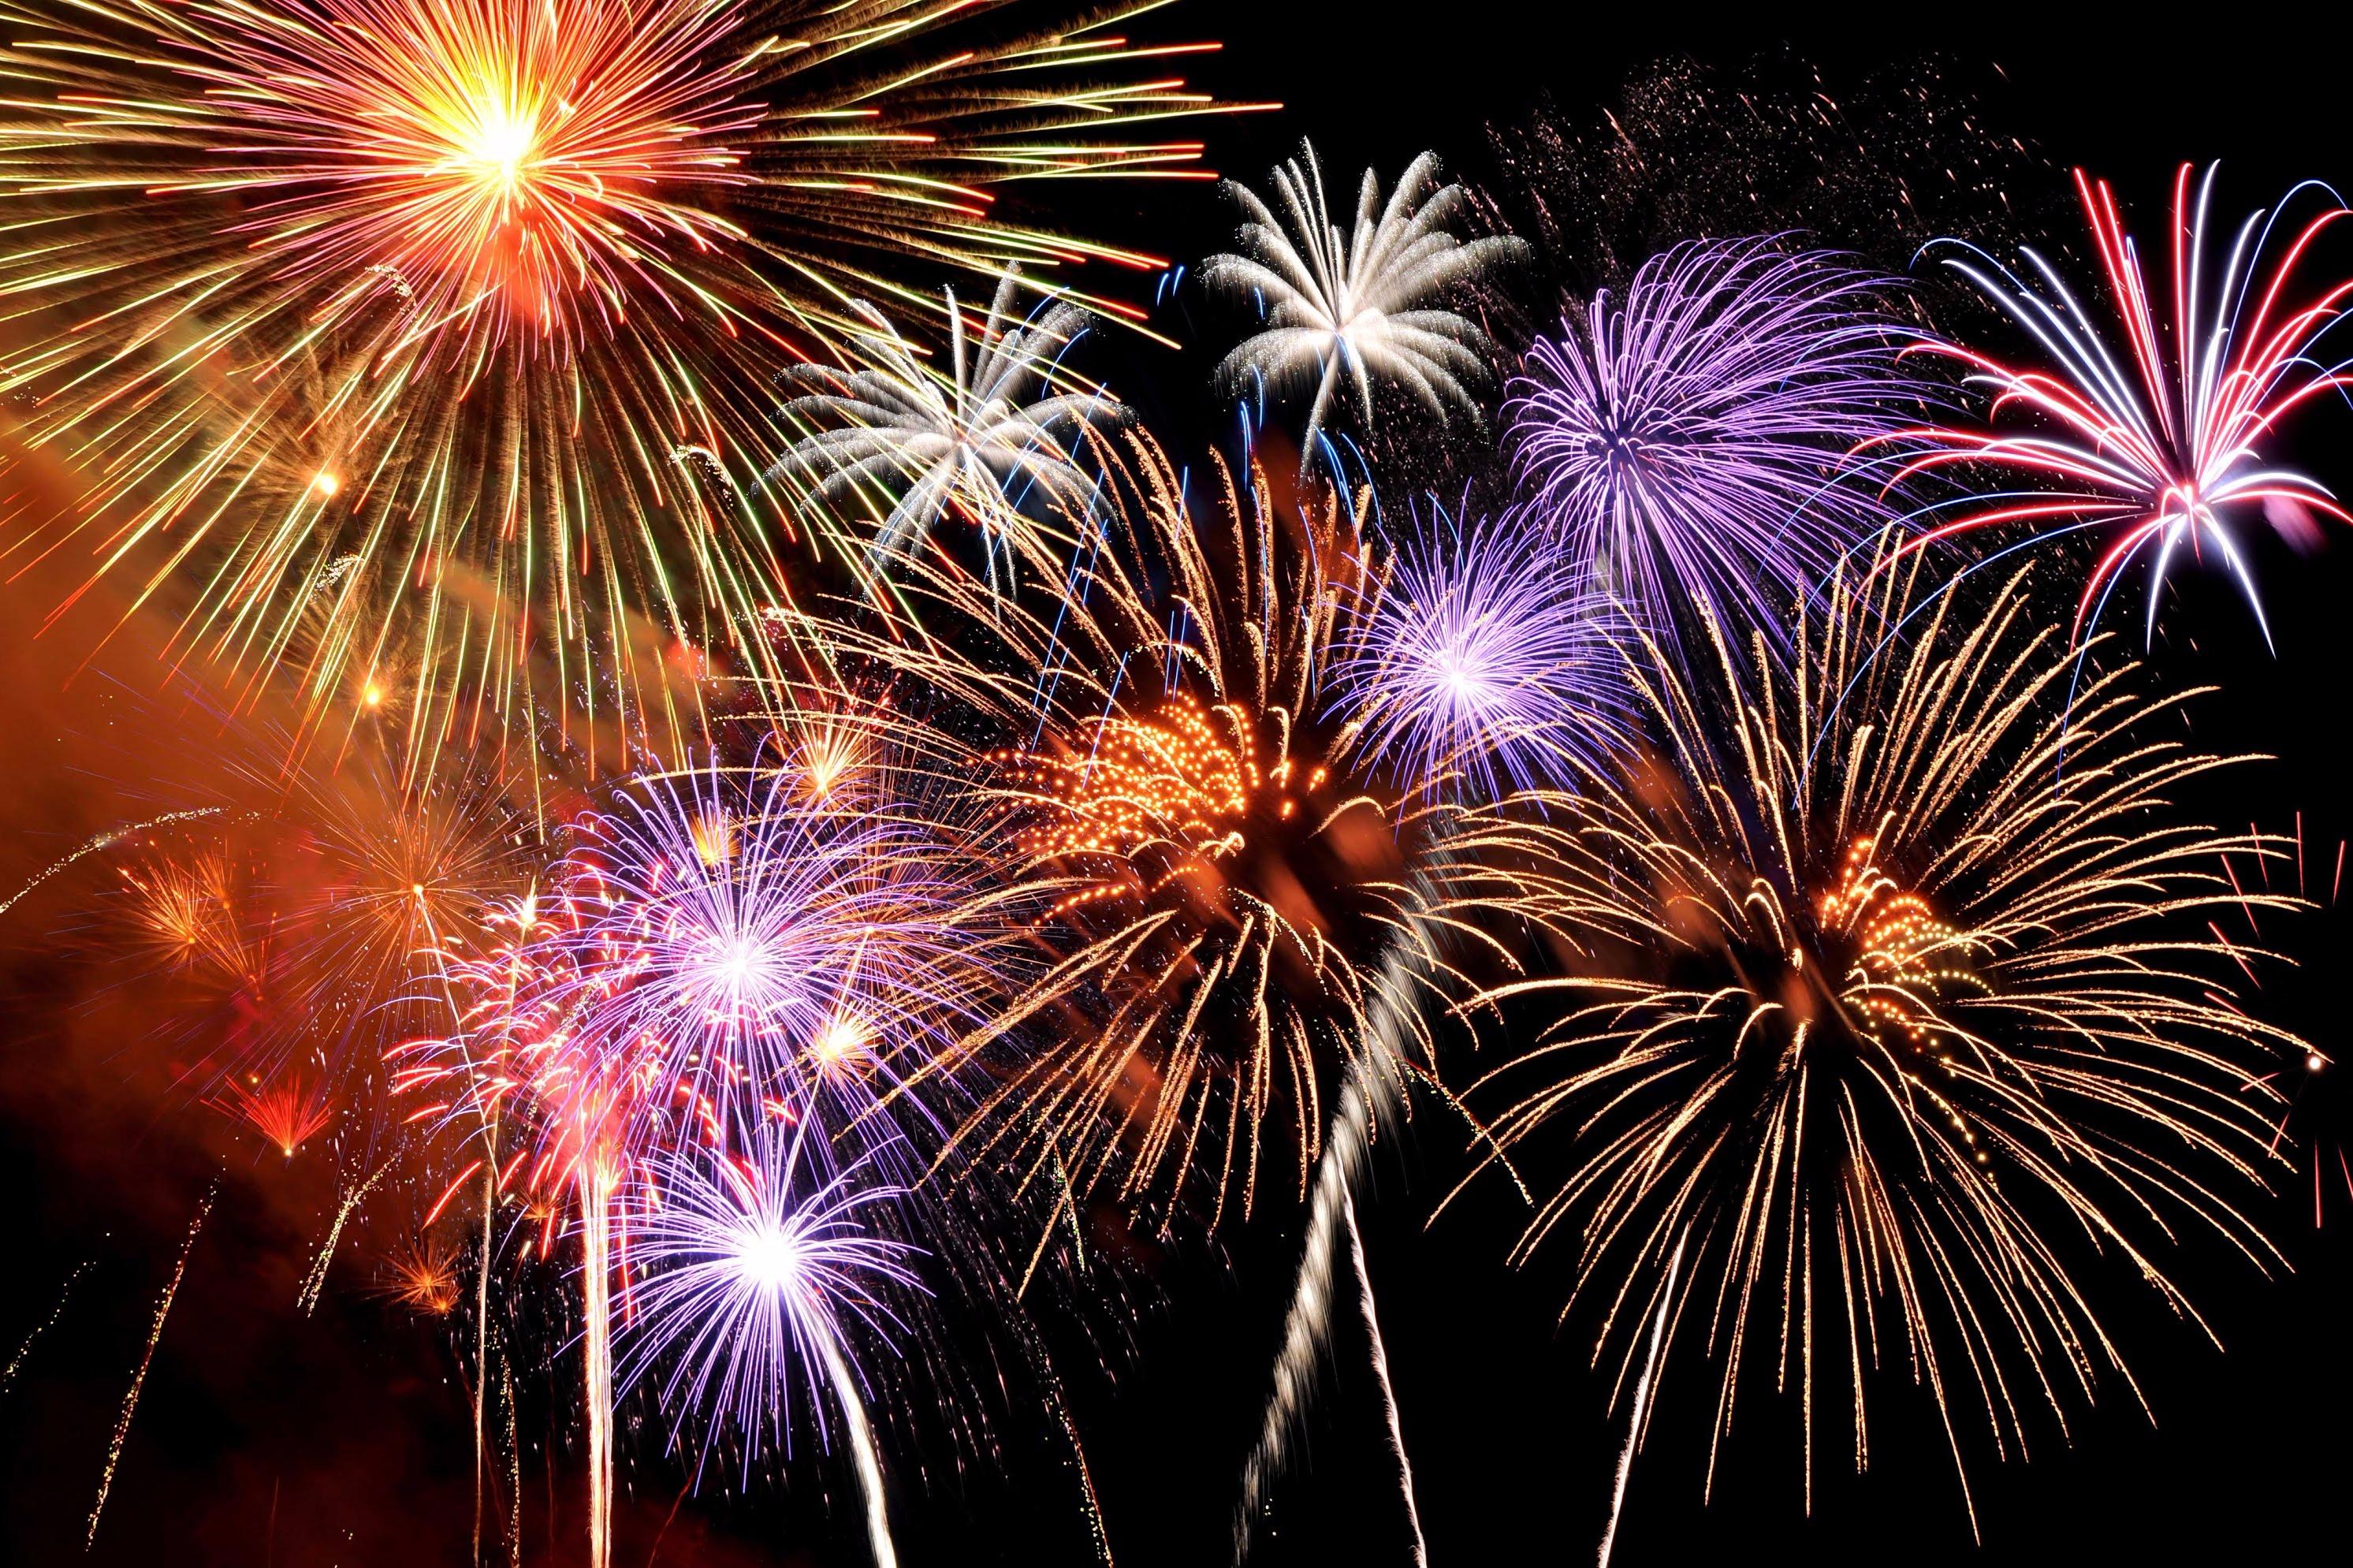 Fireworks 2015 gif